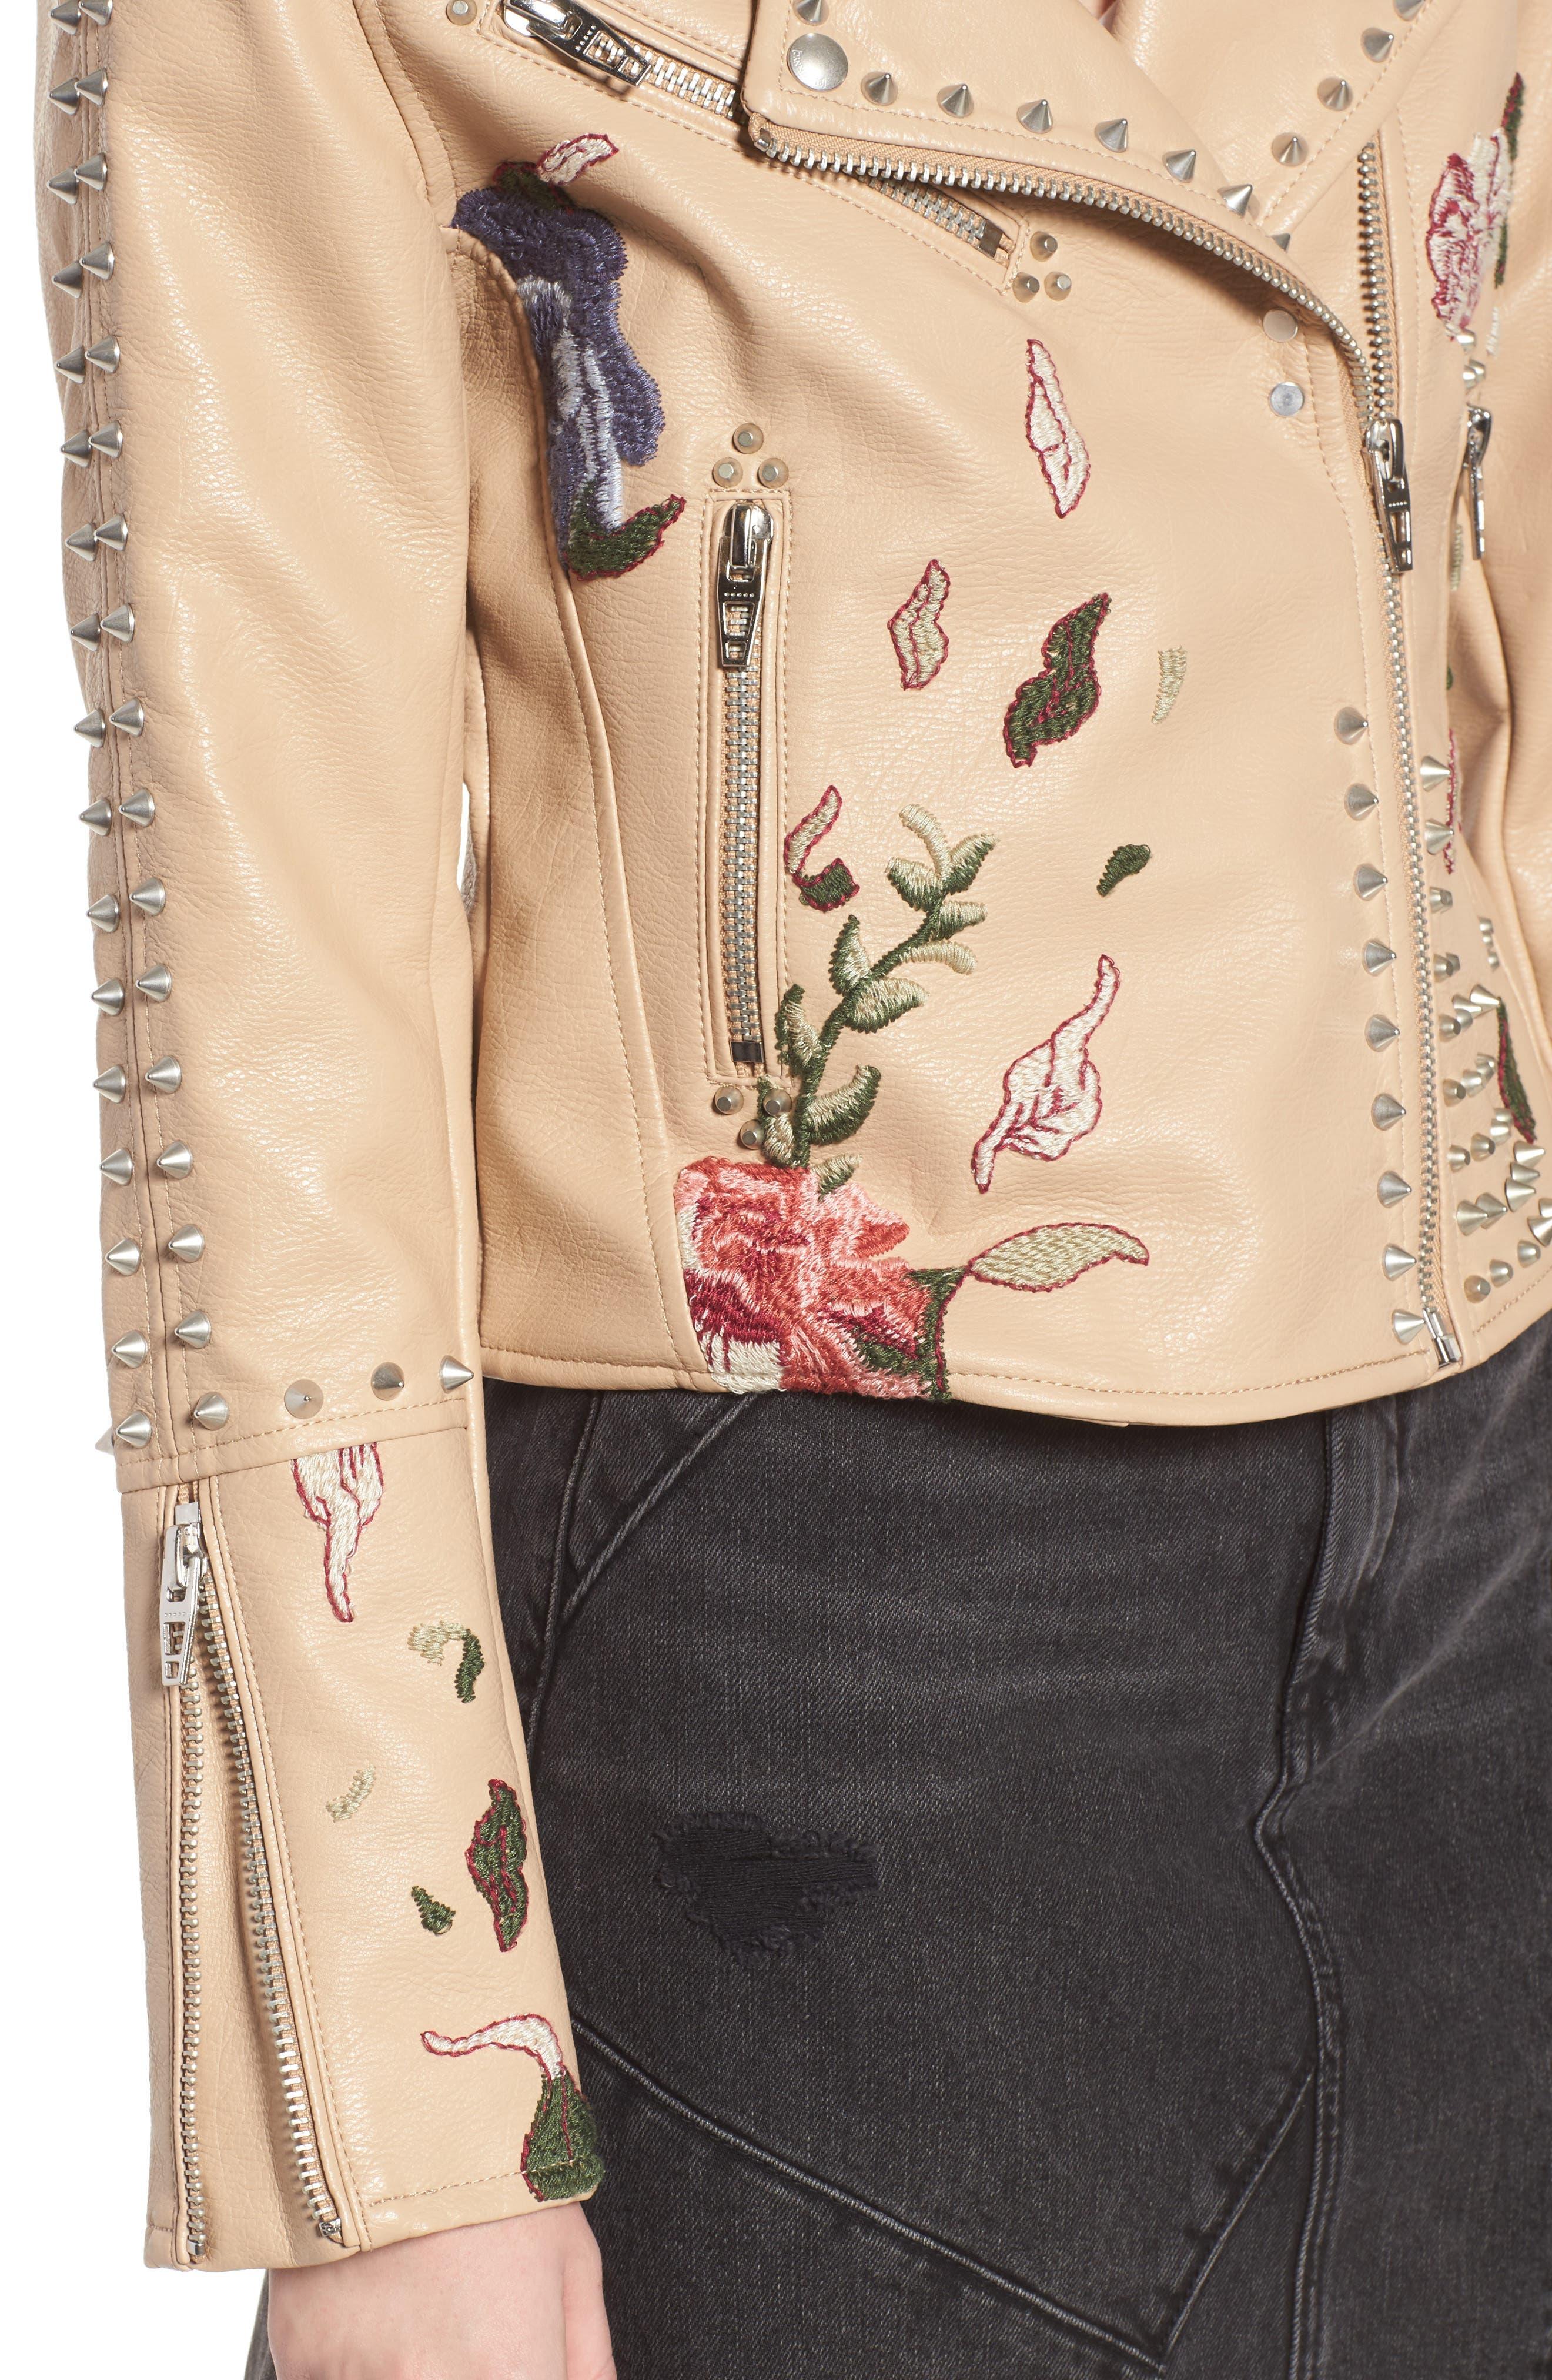 Embellished Faux Leather Moto Jacket,                             Alternate thumbnail 4, color,                             250